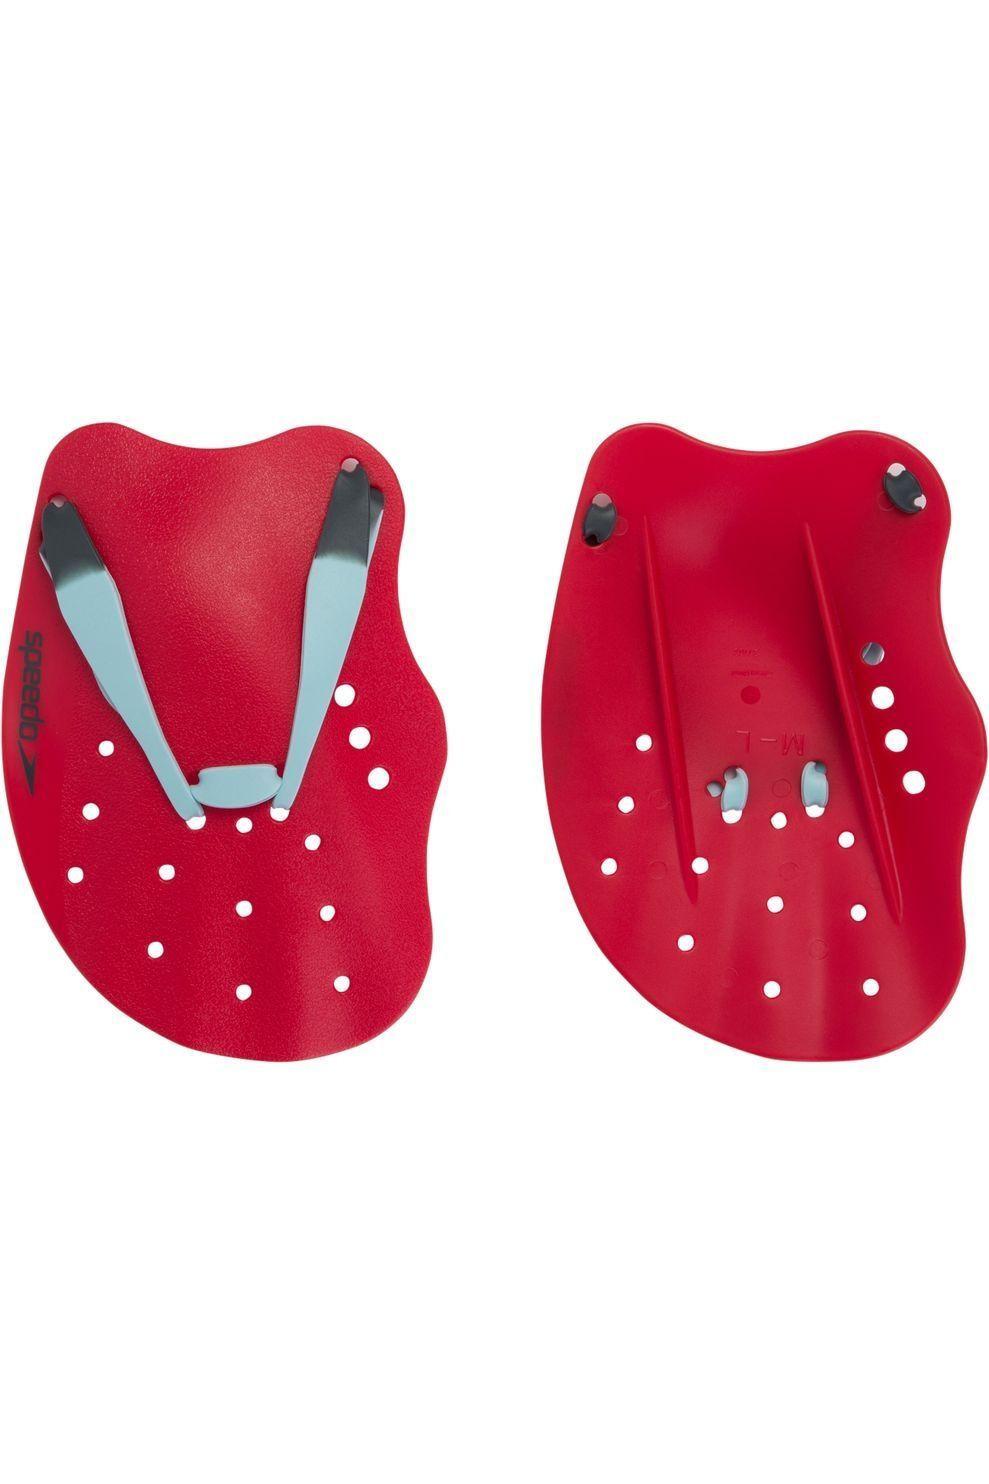 Speedo Diverse Tech Paddle - Rood - Maten: S, M, L